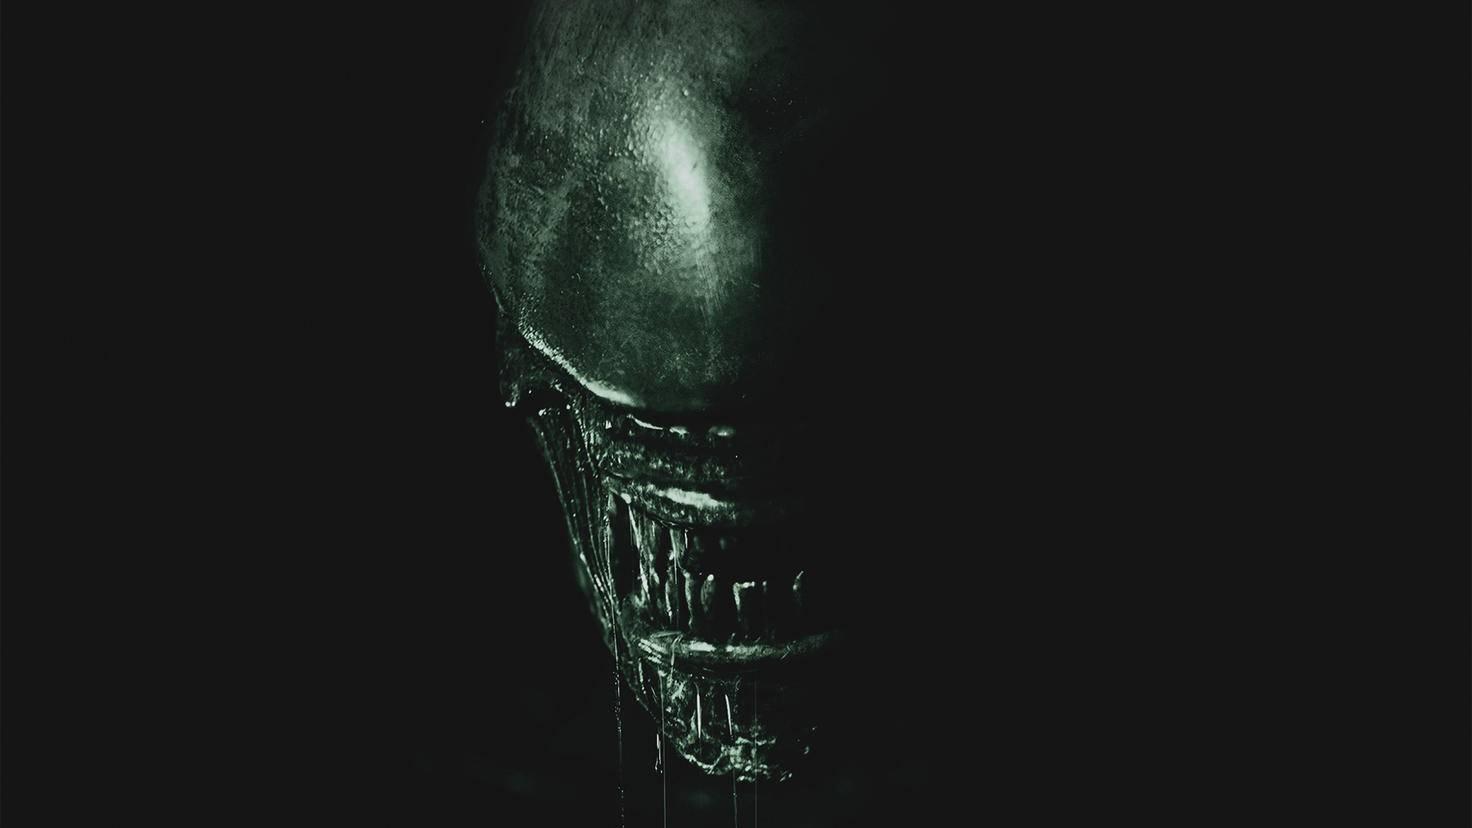 Alien_Covenant_Poster_Online_A4_zug